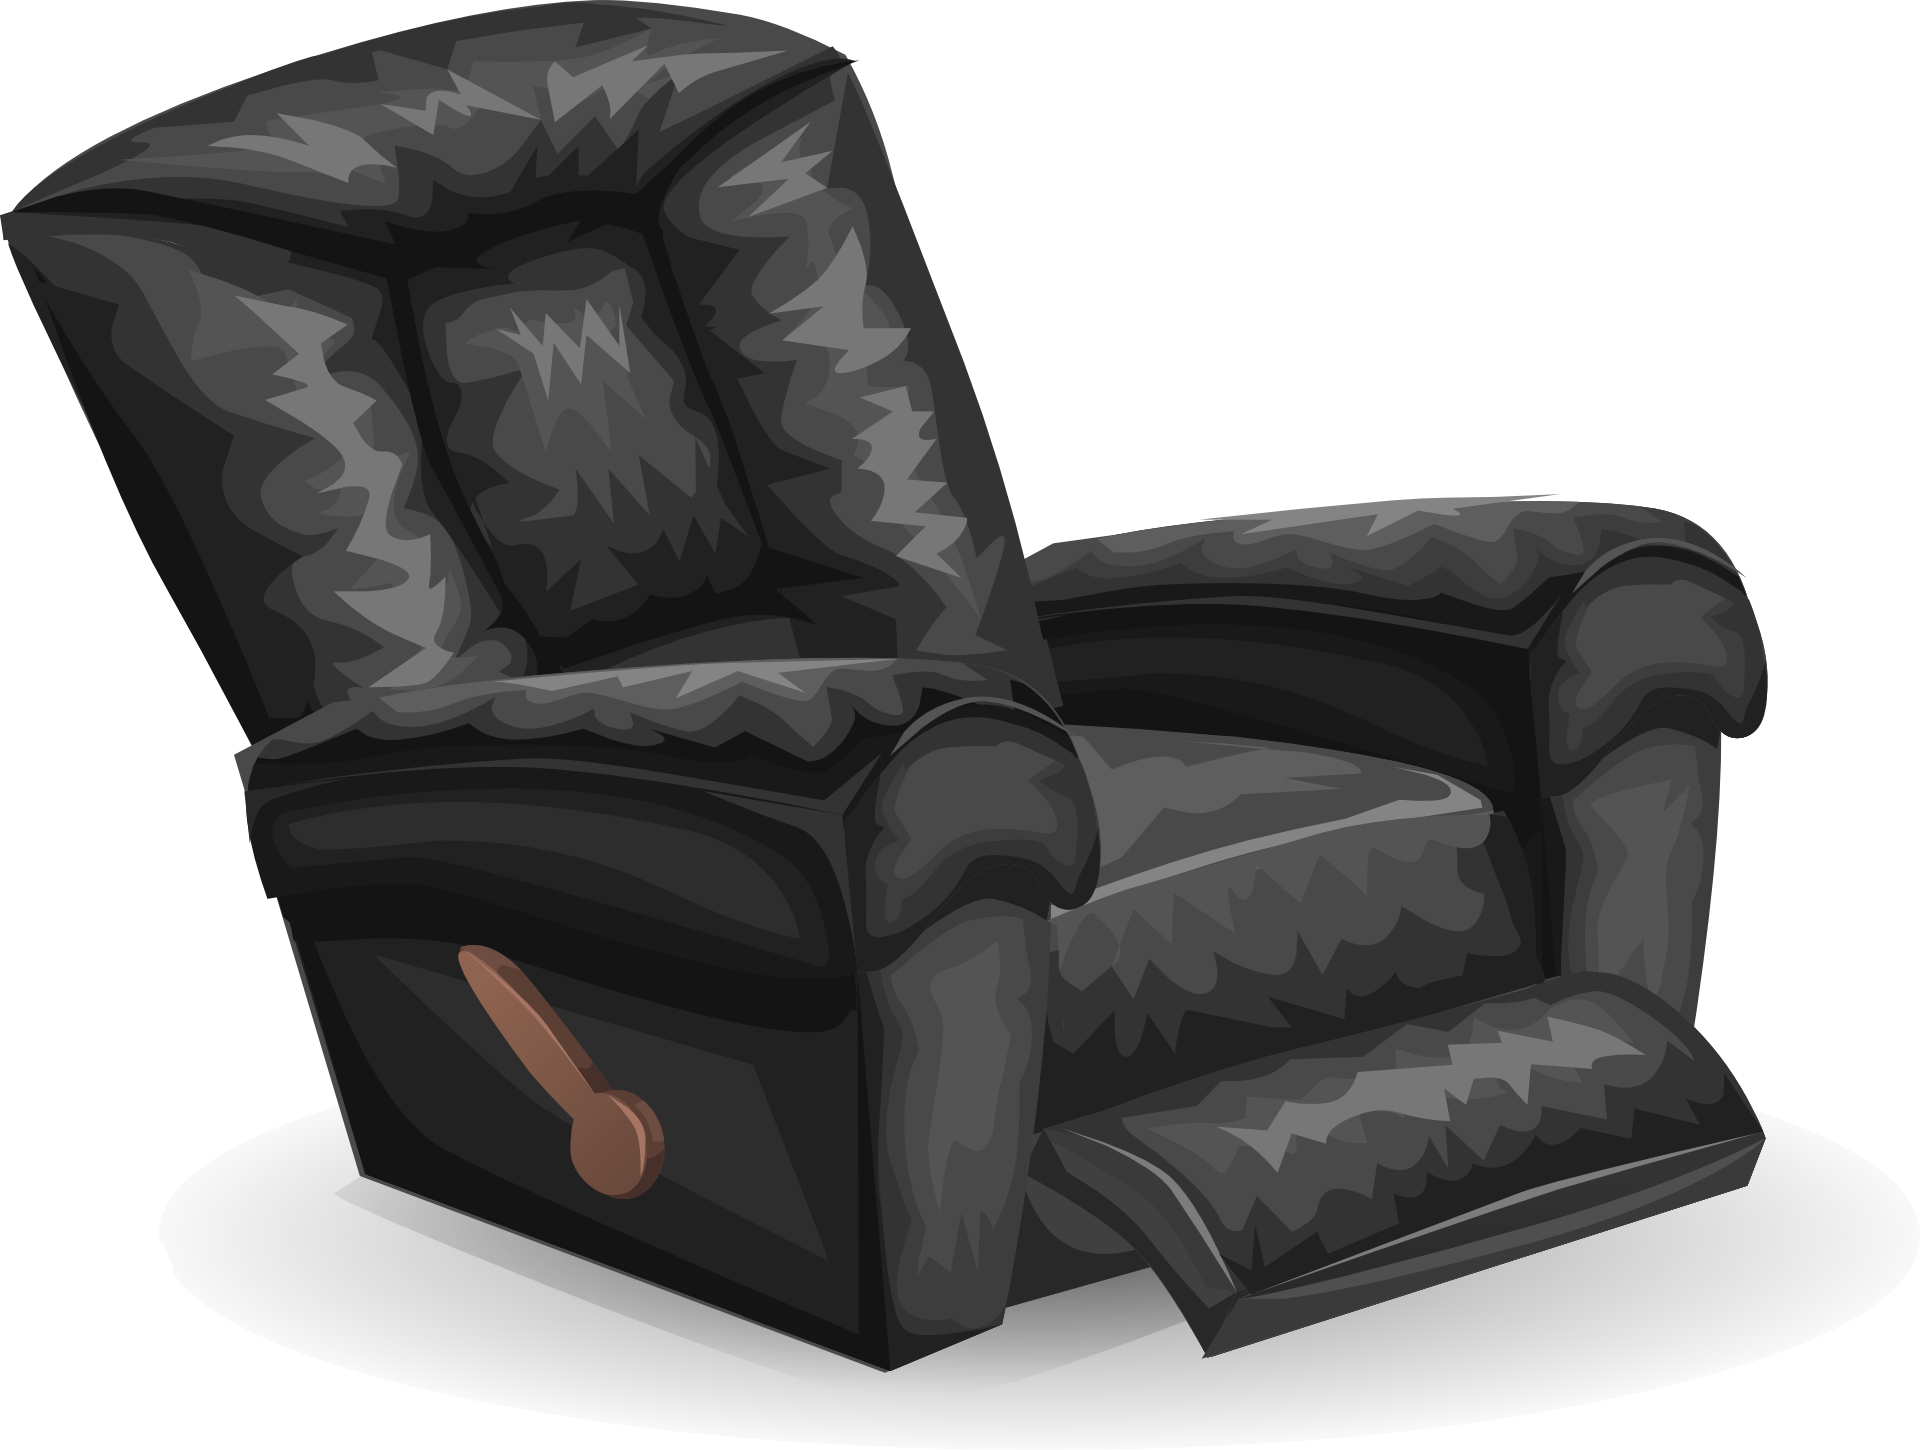 Sofa Chair Drawing Free Image